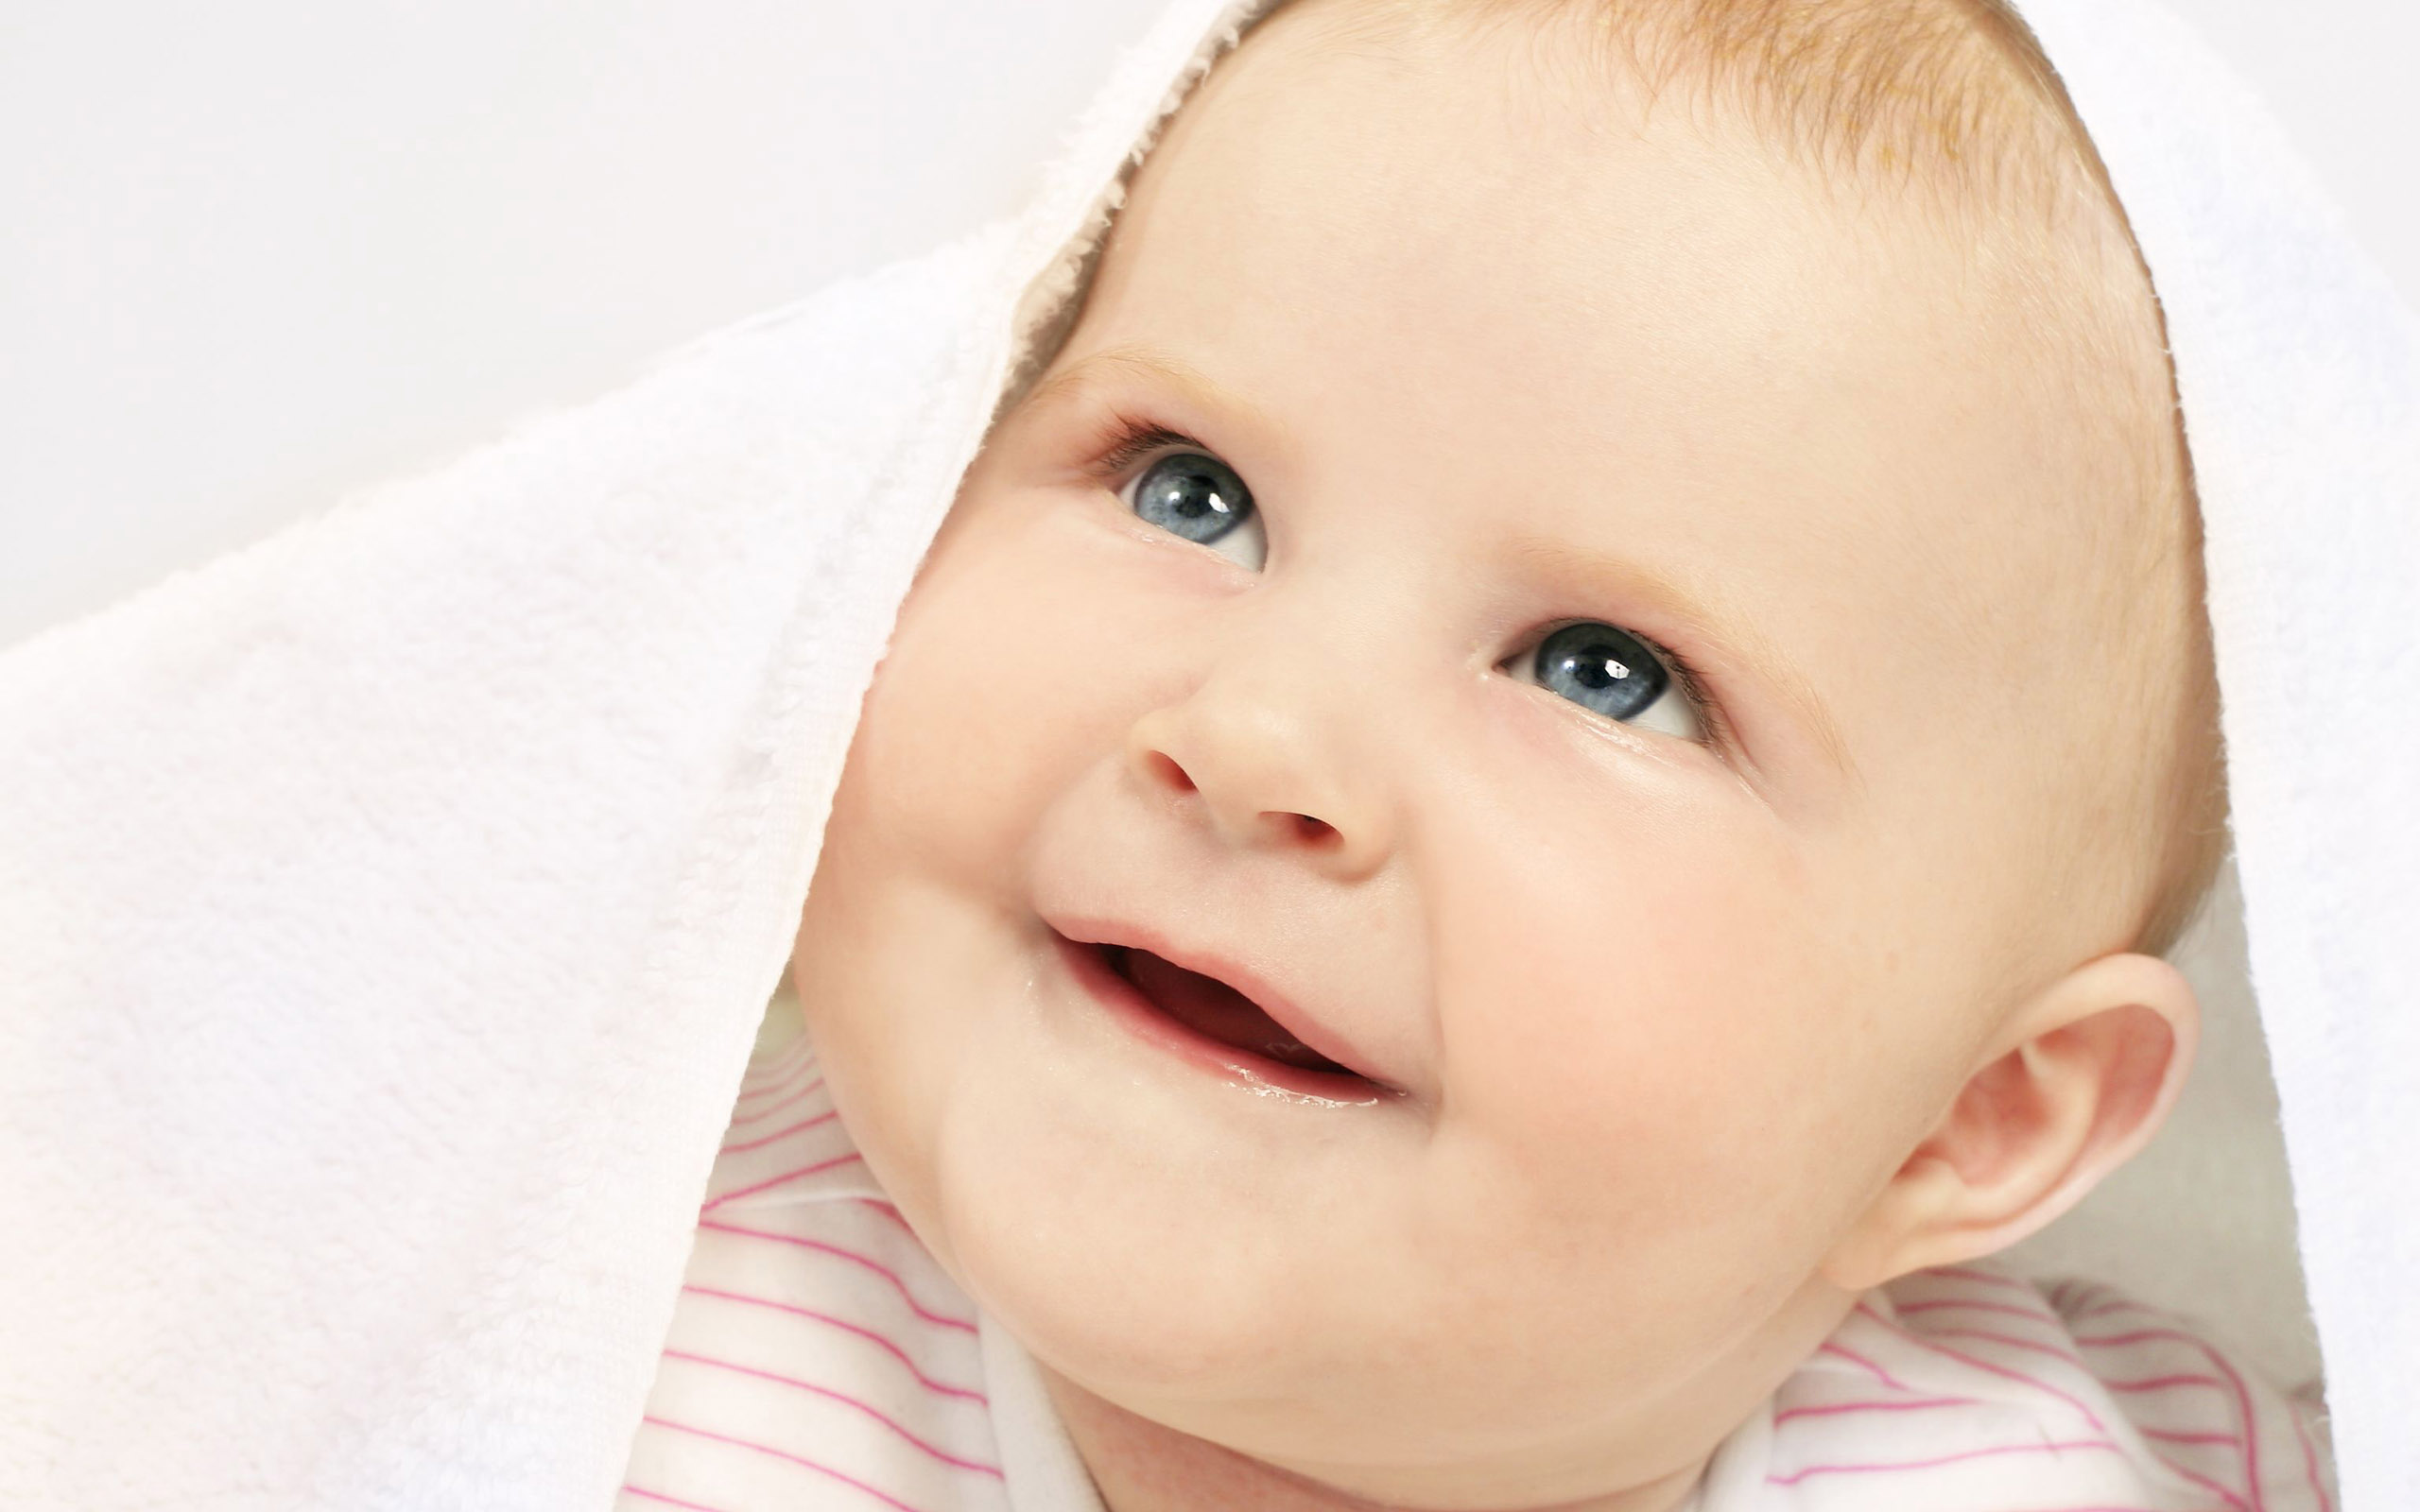 Baby Funny 1080p